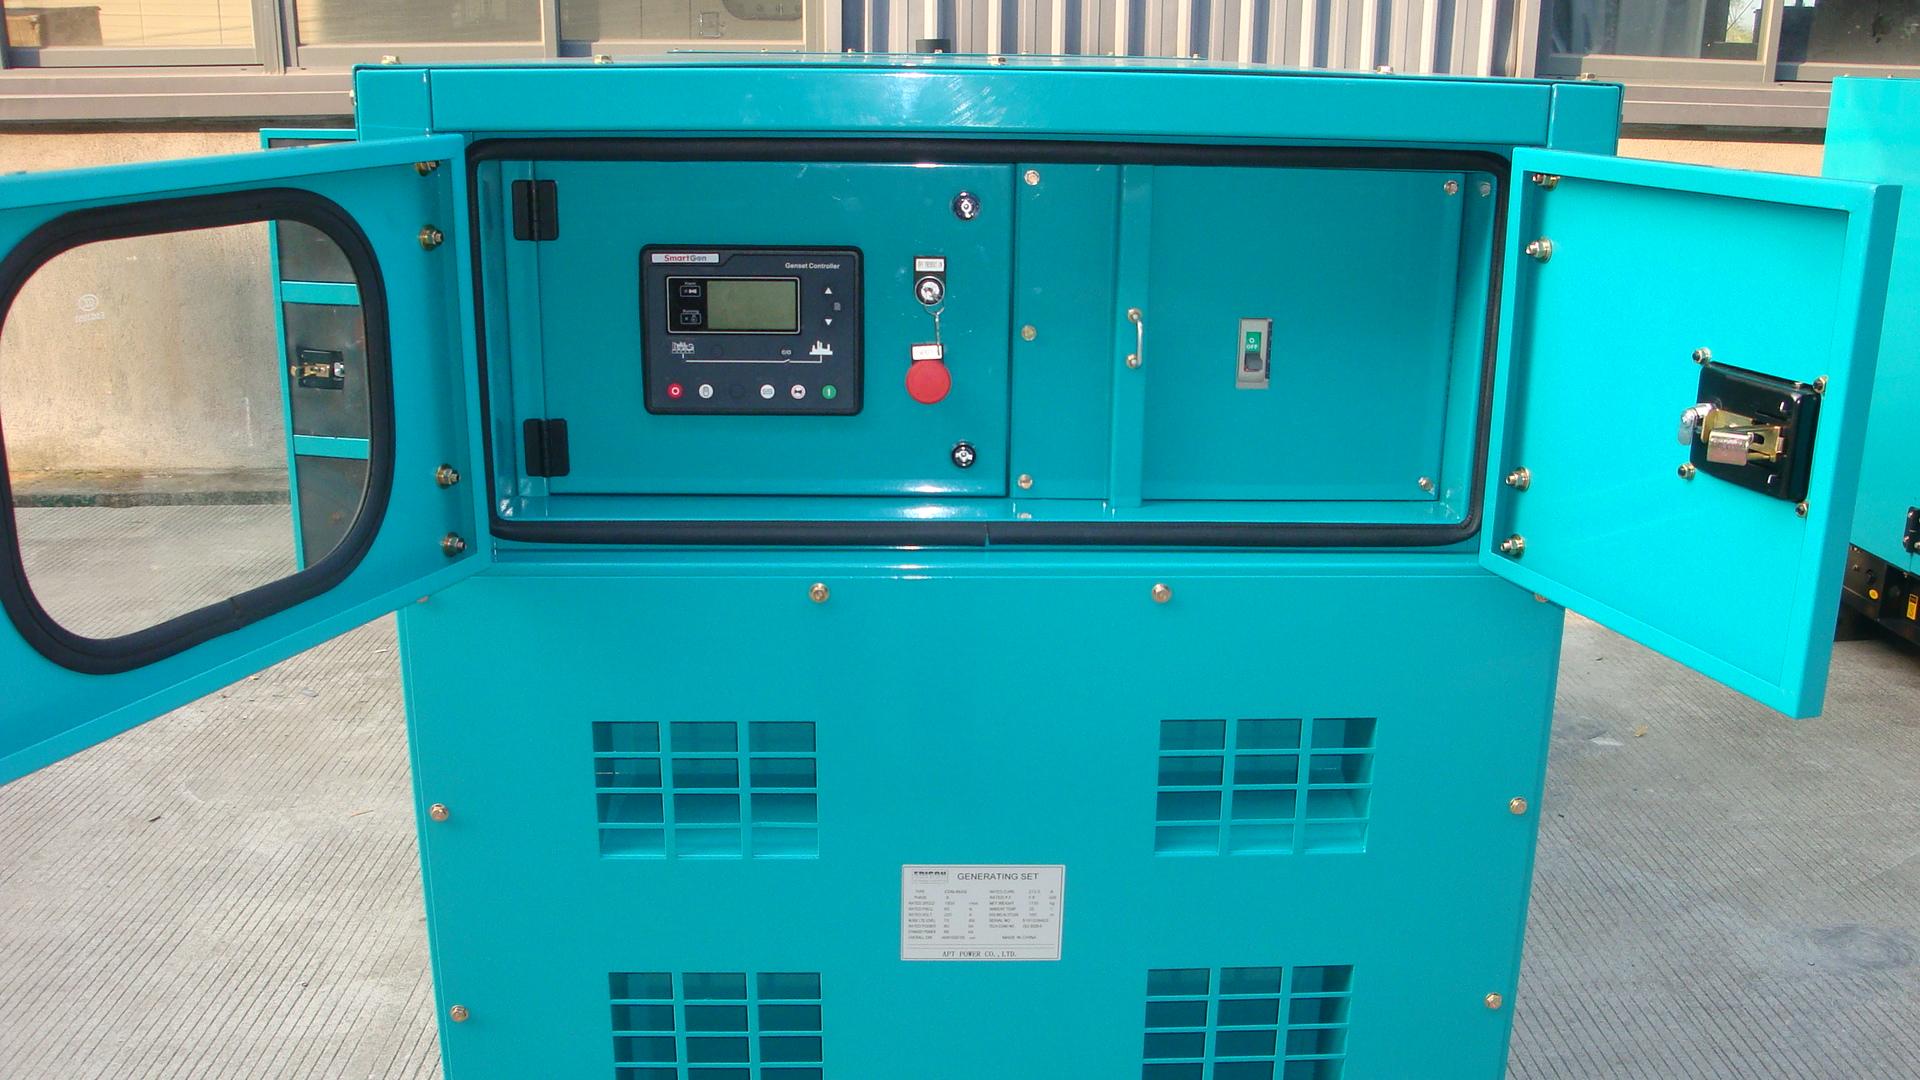 12kW Enclosed Perkins Diesel Generator with Weather Proof Silent